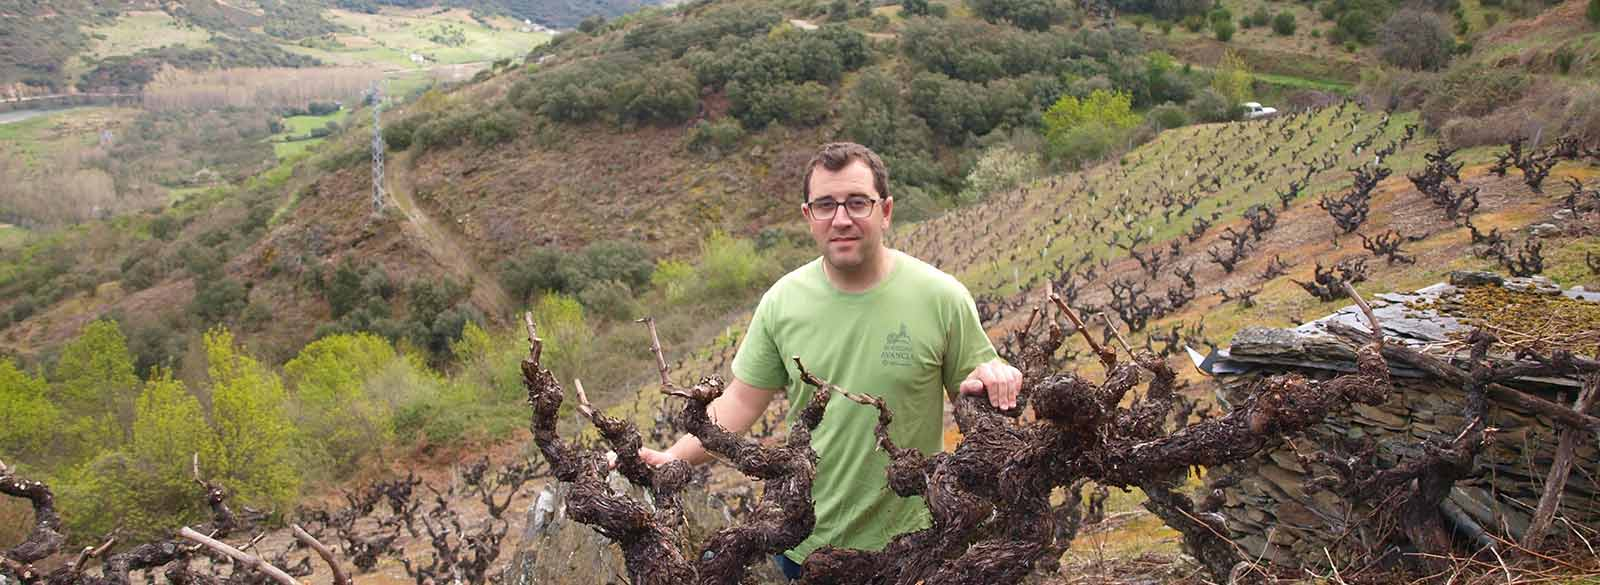 Nacho Álvarez, director de enología de Grupo Jorge Ordóñez